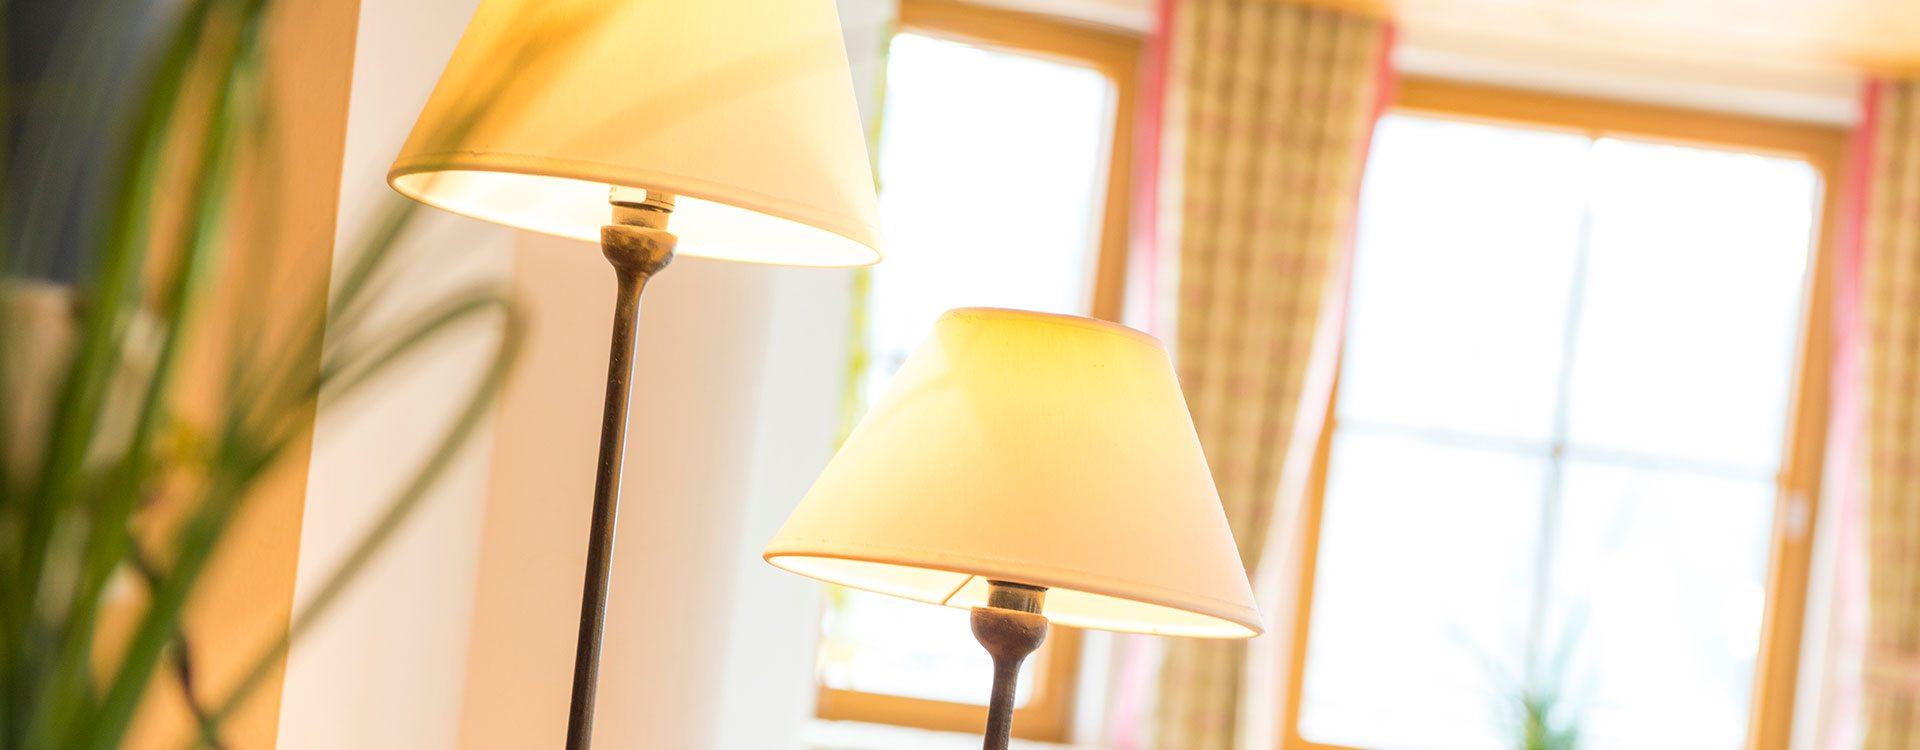 4 Sterne Hotel & Berggasthaus Alpenklang in Großarl, Salzburger Land